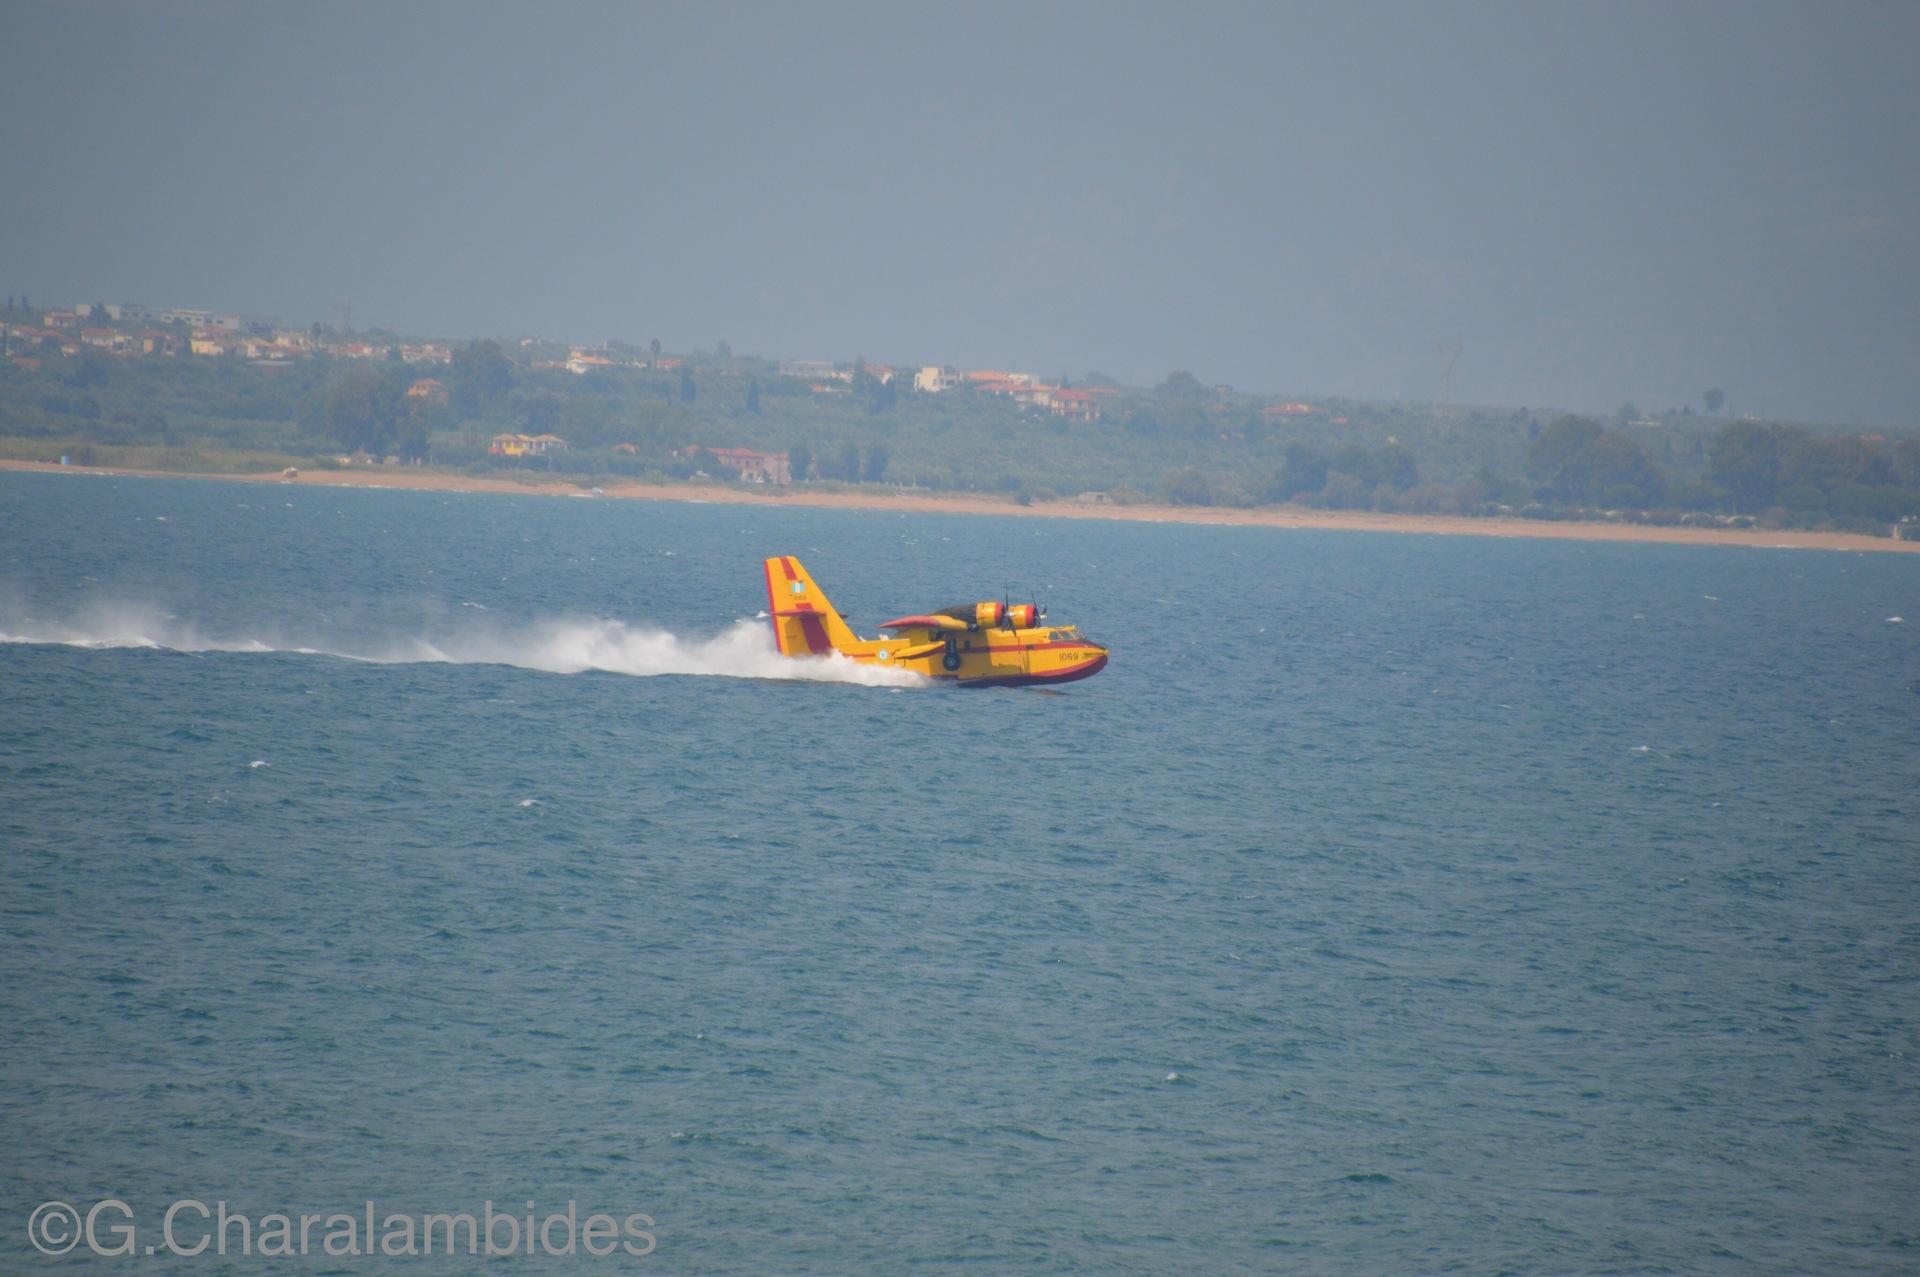 Firefighters    geofaz, water, watercraft, vehicle